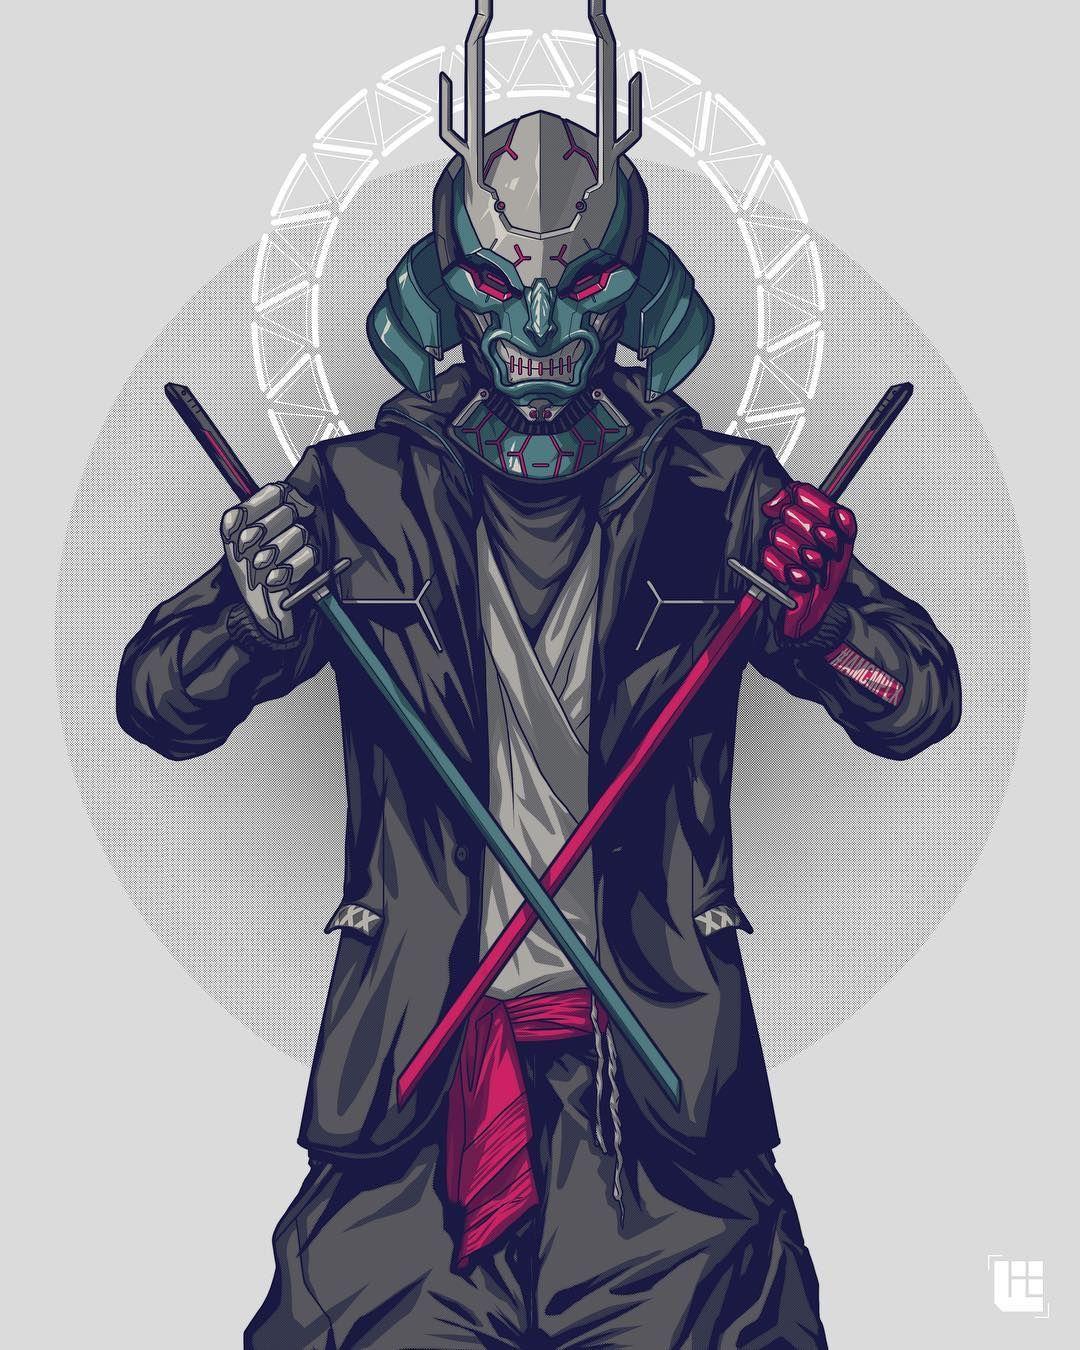 I Bathe In The Toxic Venom Of Those Dead Snakes Godcomplex Ryujin Iamcmplx Samurai Art Samurai Artwork Cyberpunk Art